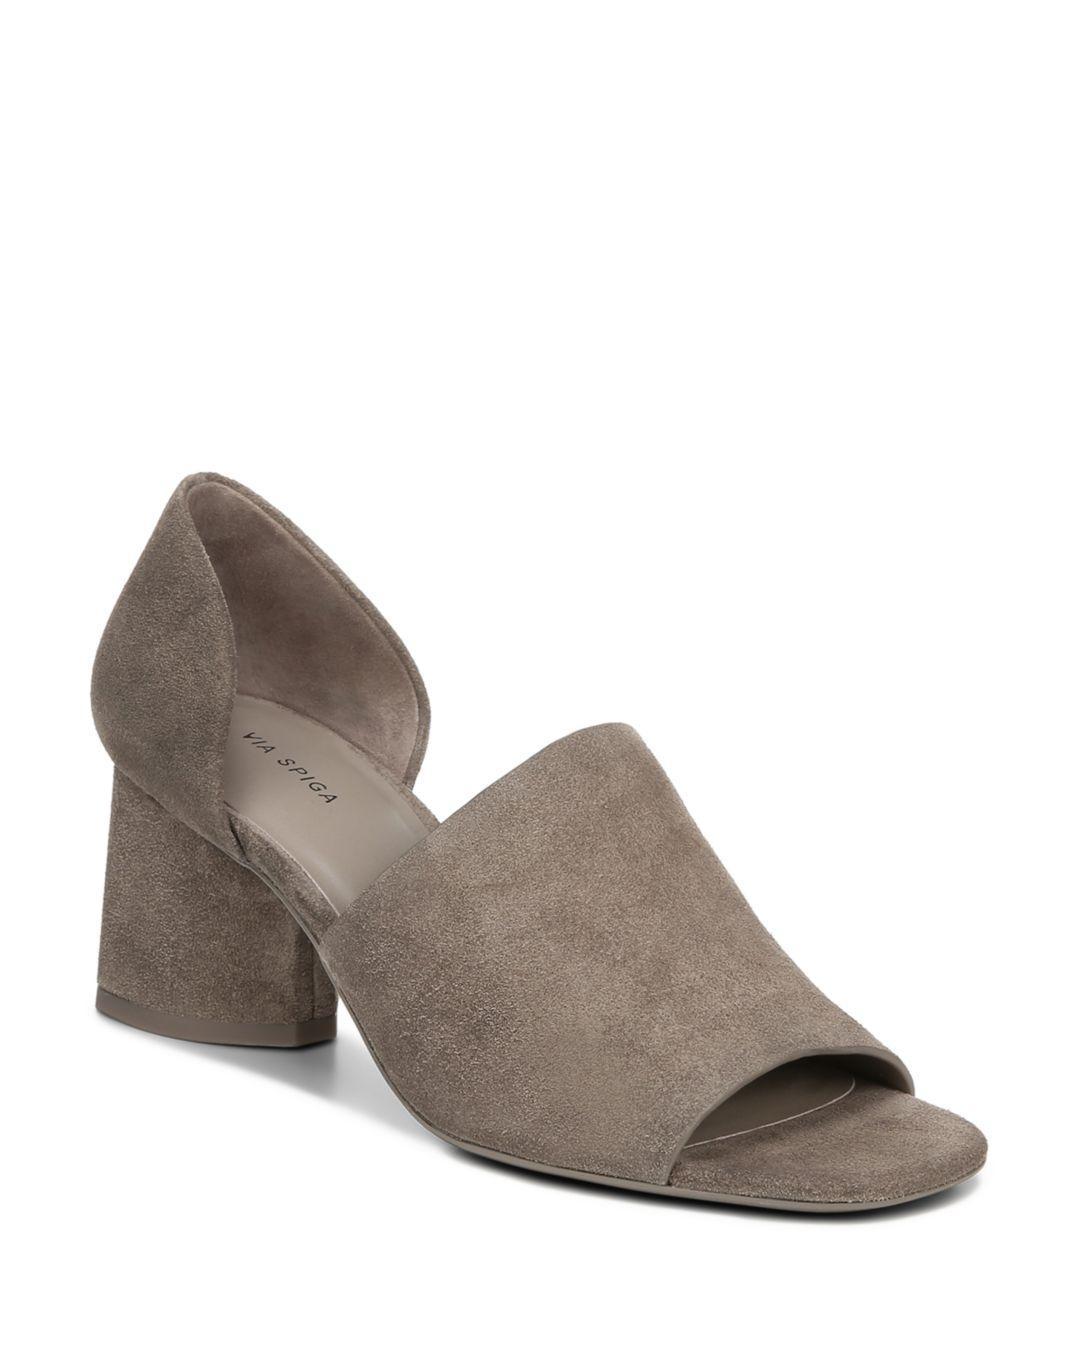 f4358a999b65 Via Spiga - Brown Women s Leah Block Heel Sandals - Lyst. View fullscreen